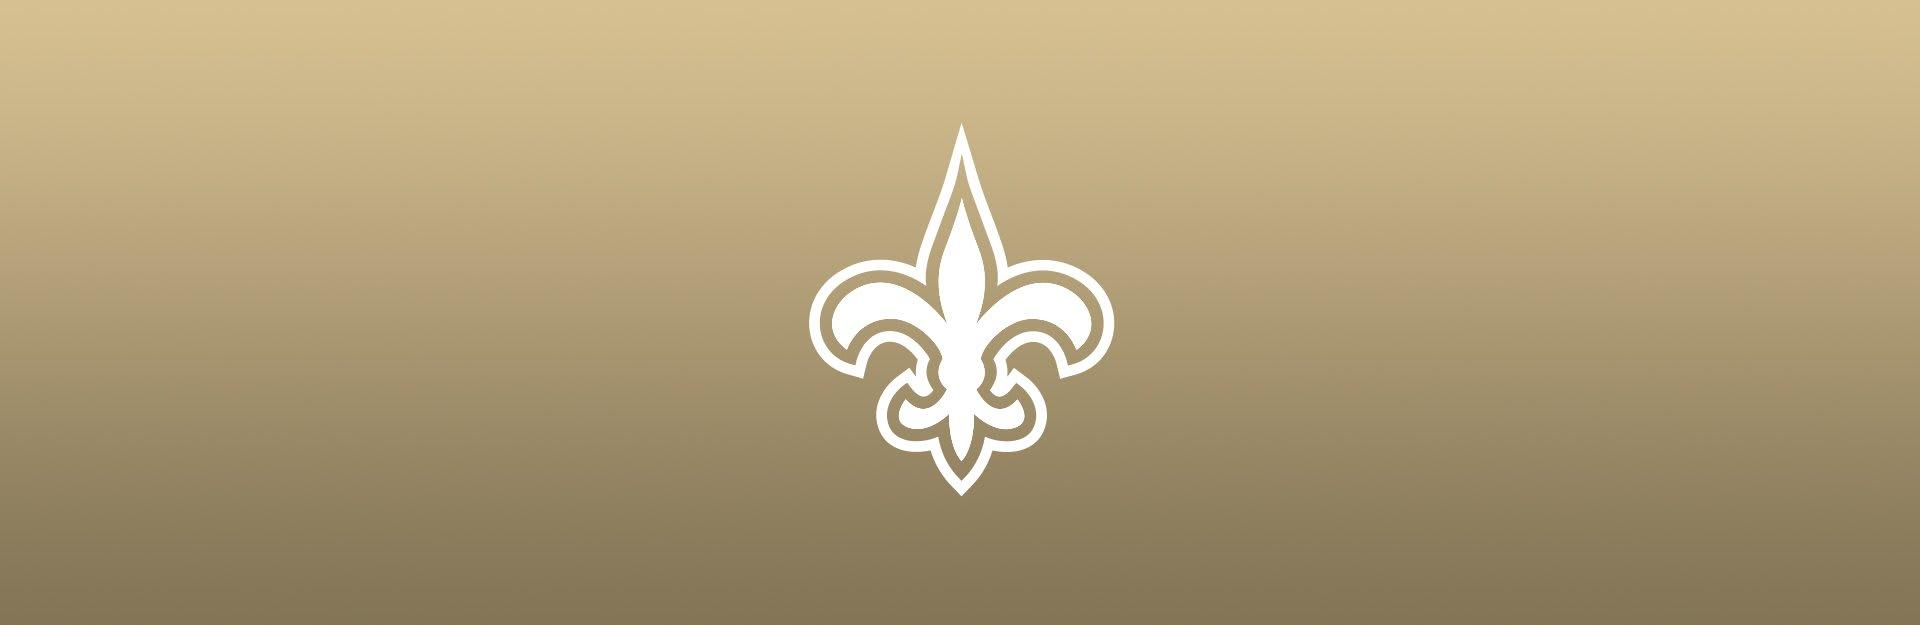 New Orleans Saints logo overlaid on tan background